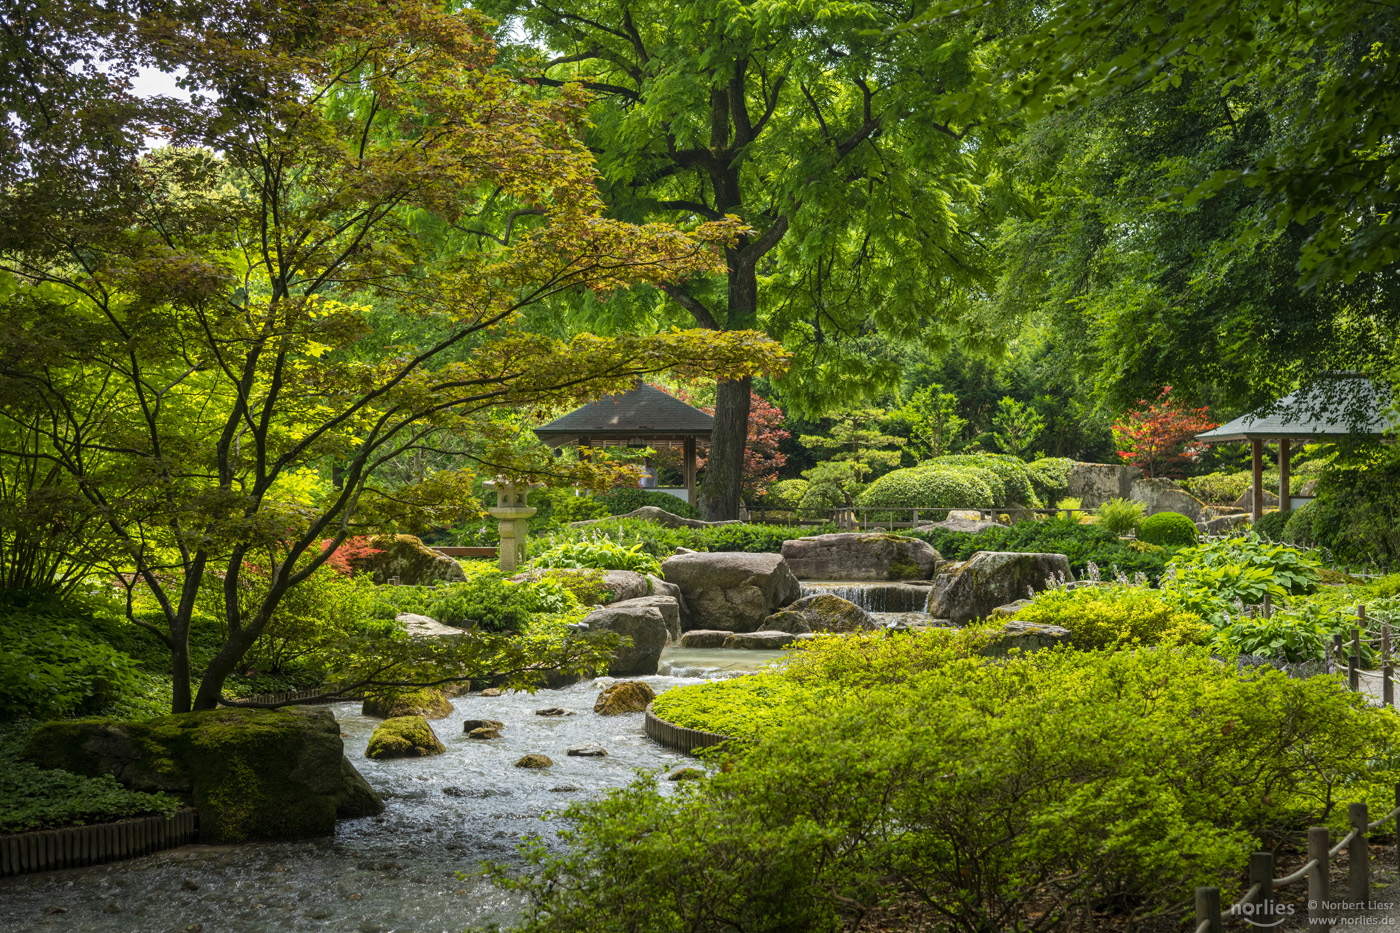 Der Japanische Garten in Augsburg © Foto: Norbert Liesz